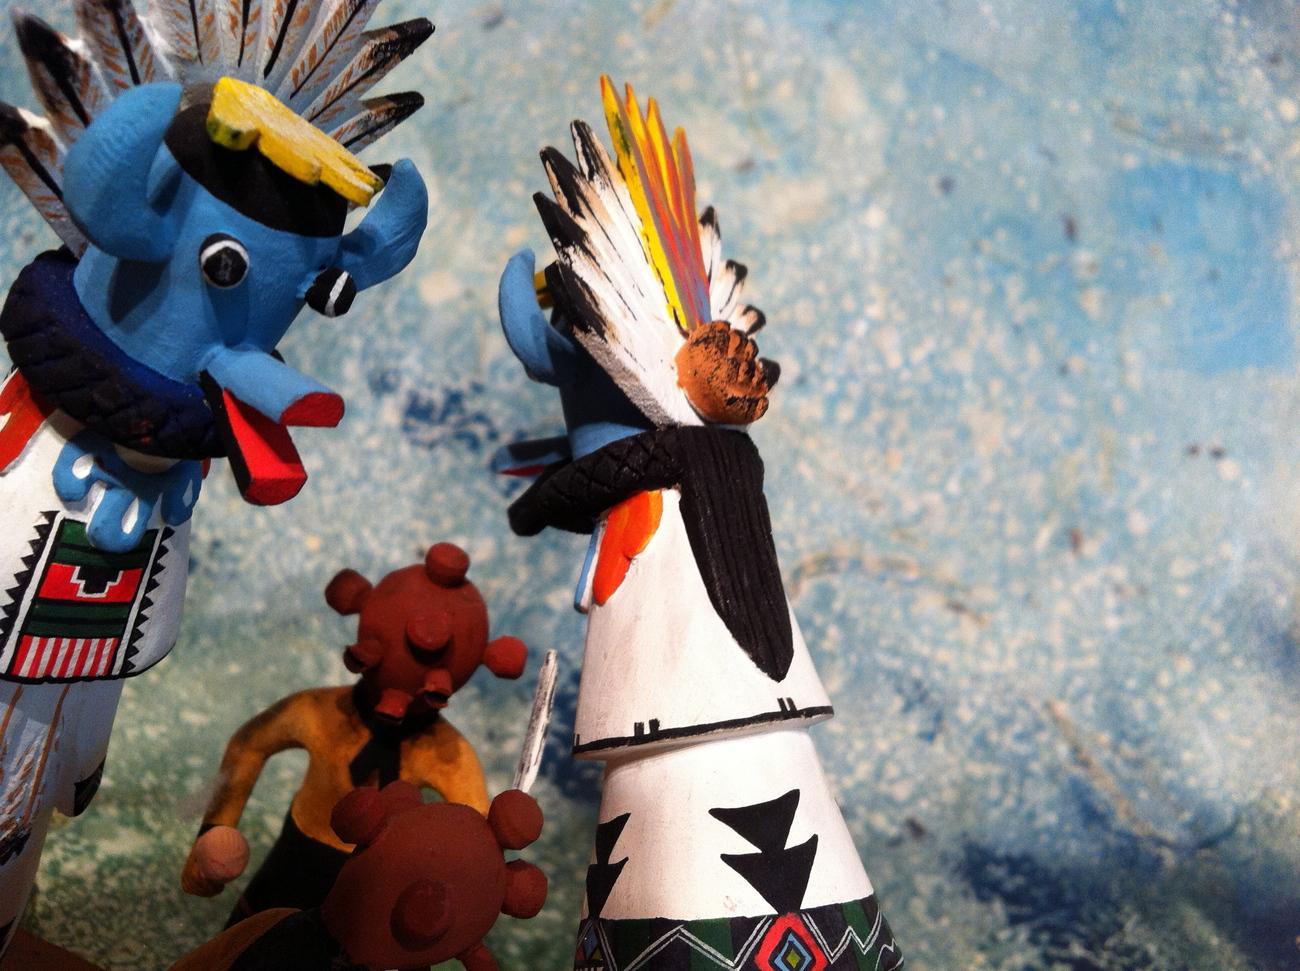 Miniature Mudhead and Shalako Kachina dolls in a Dance